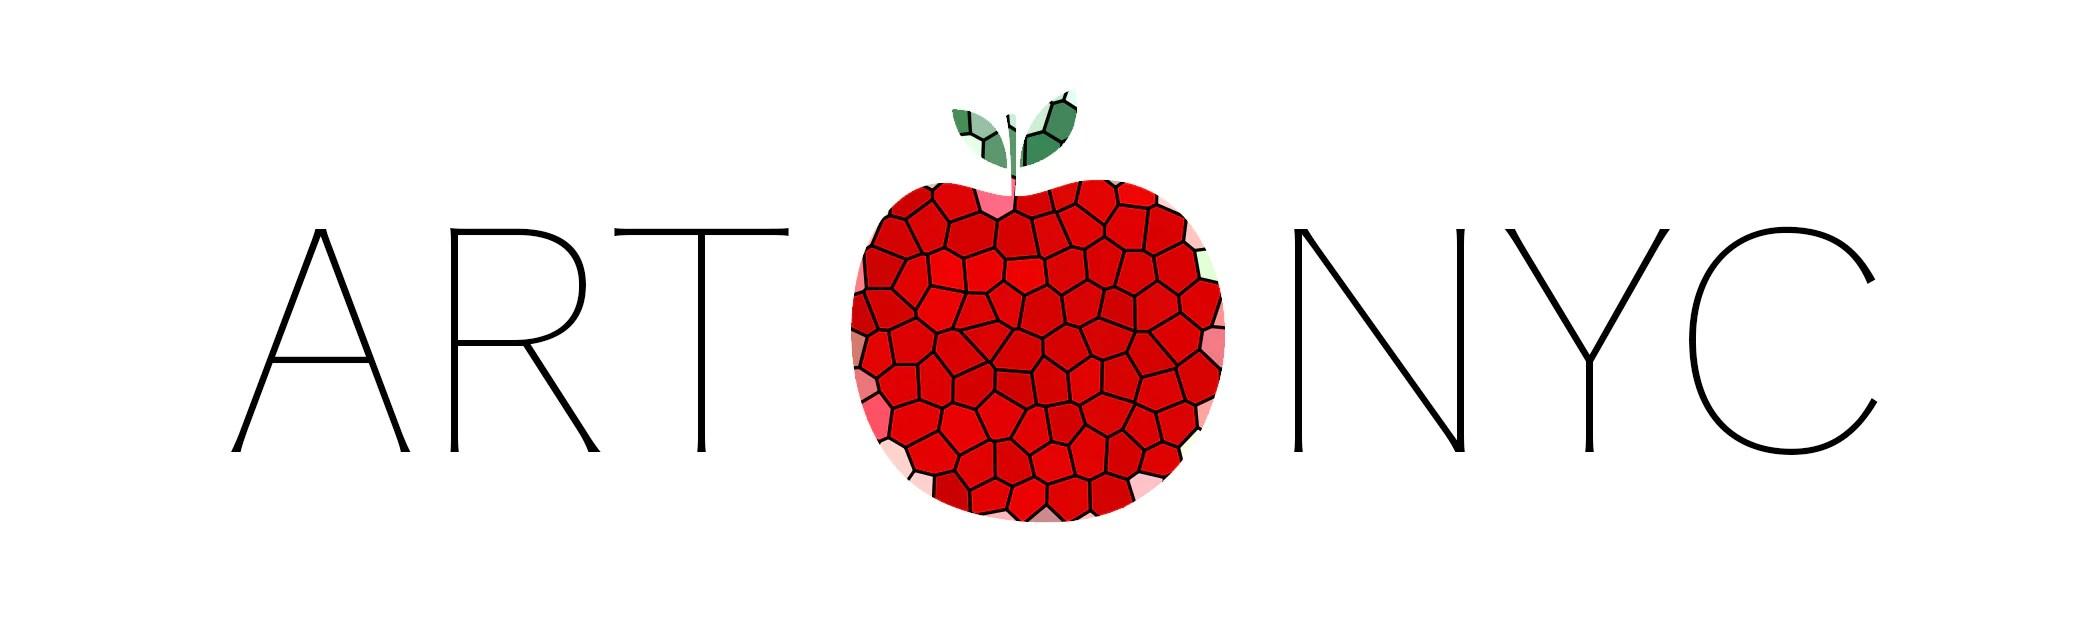 art apple nyc